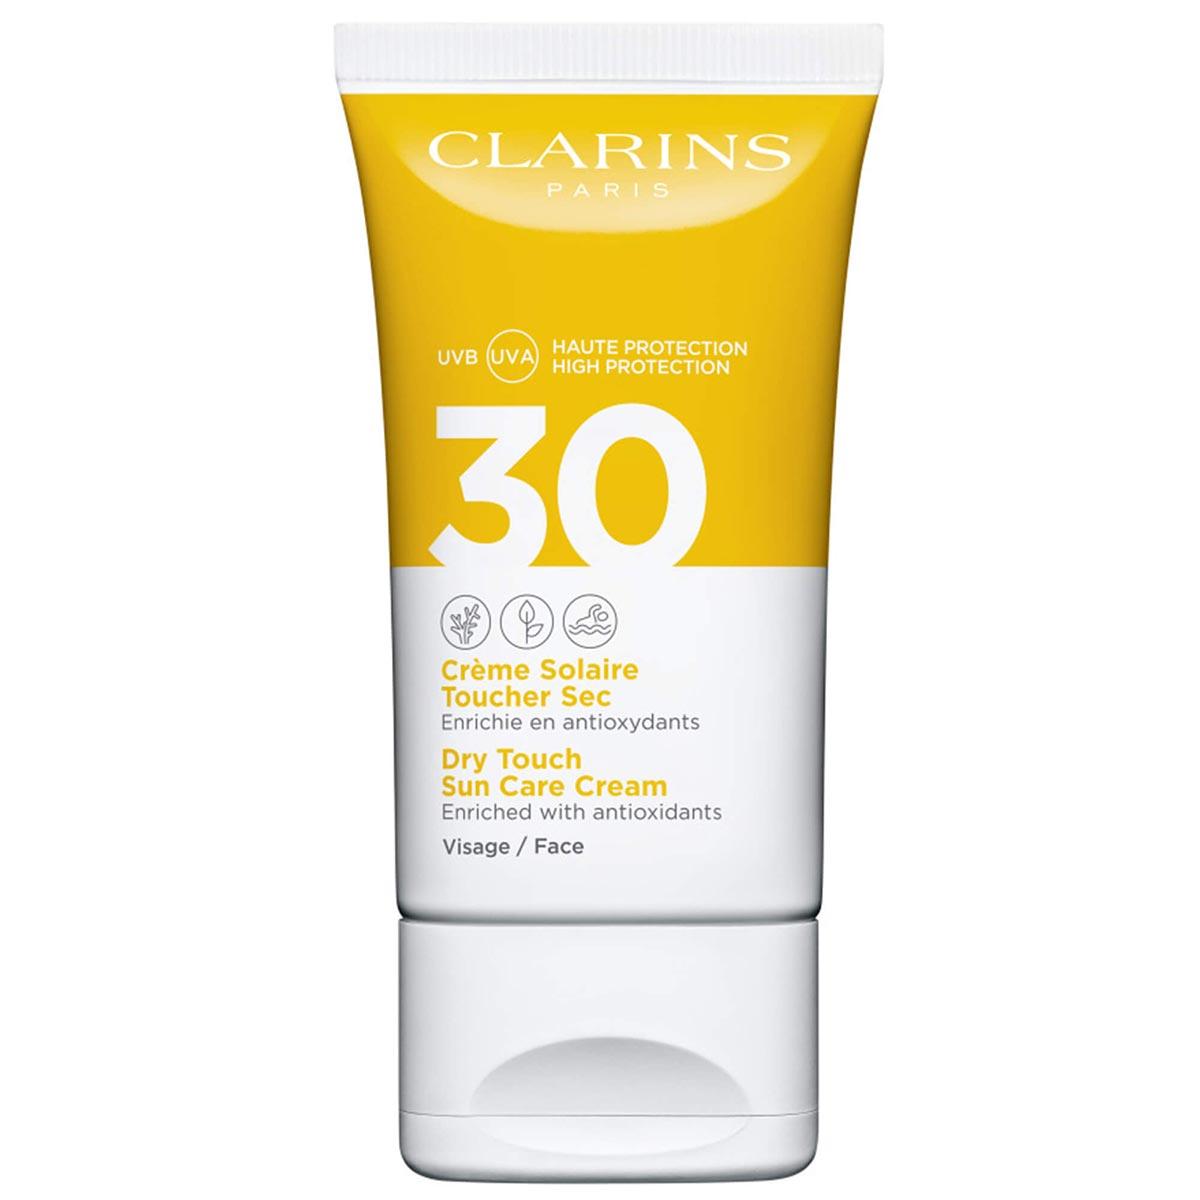 Clarins - Crème Solaire Toucher Sec Visage - UVA/UVB30 50 ml